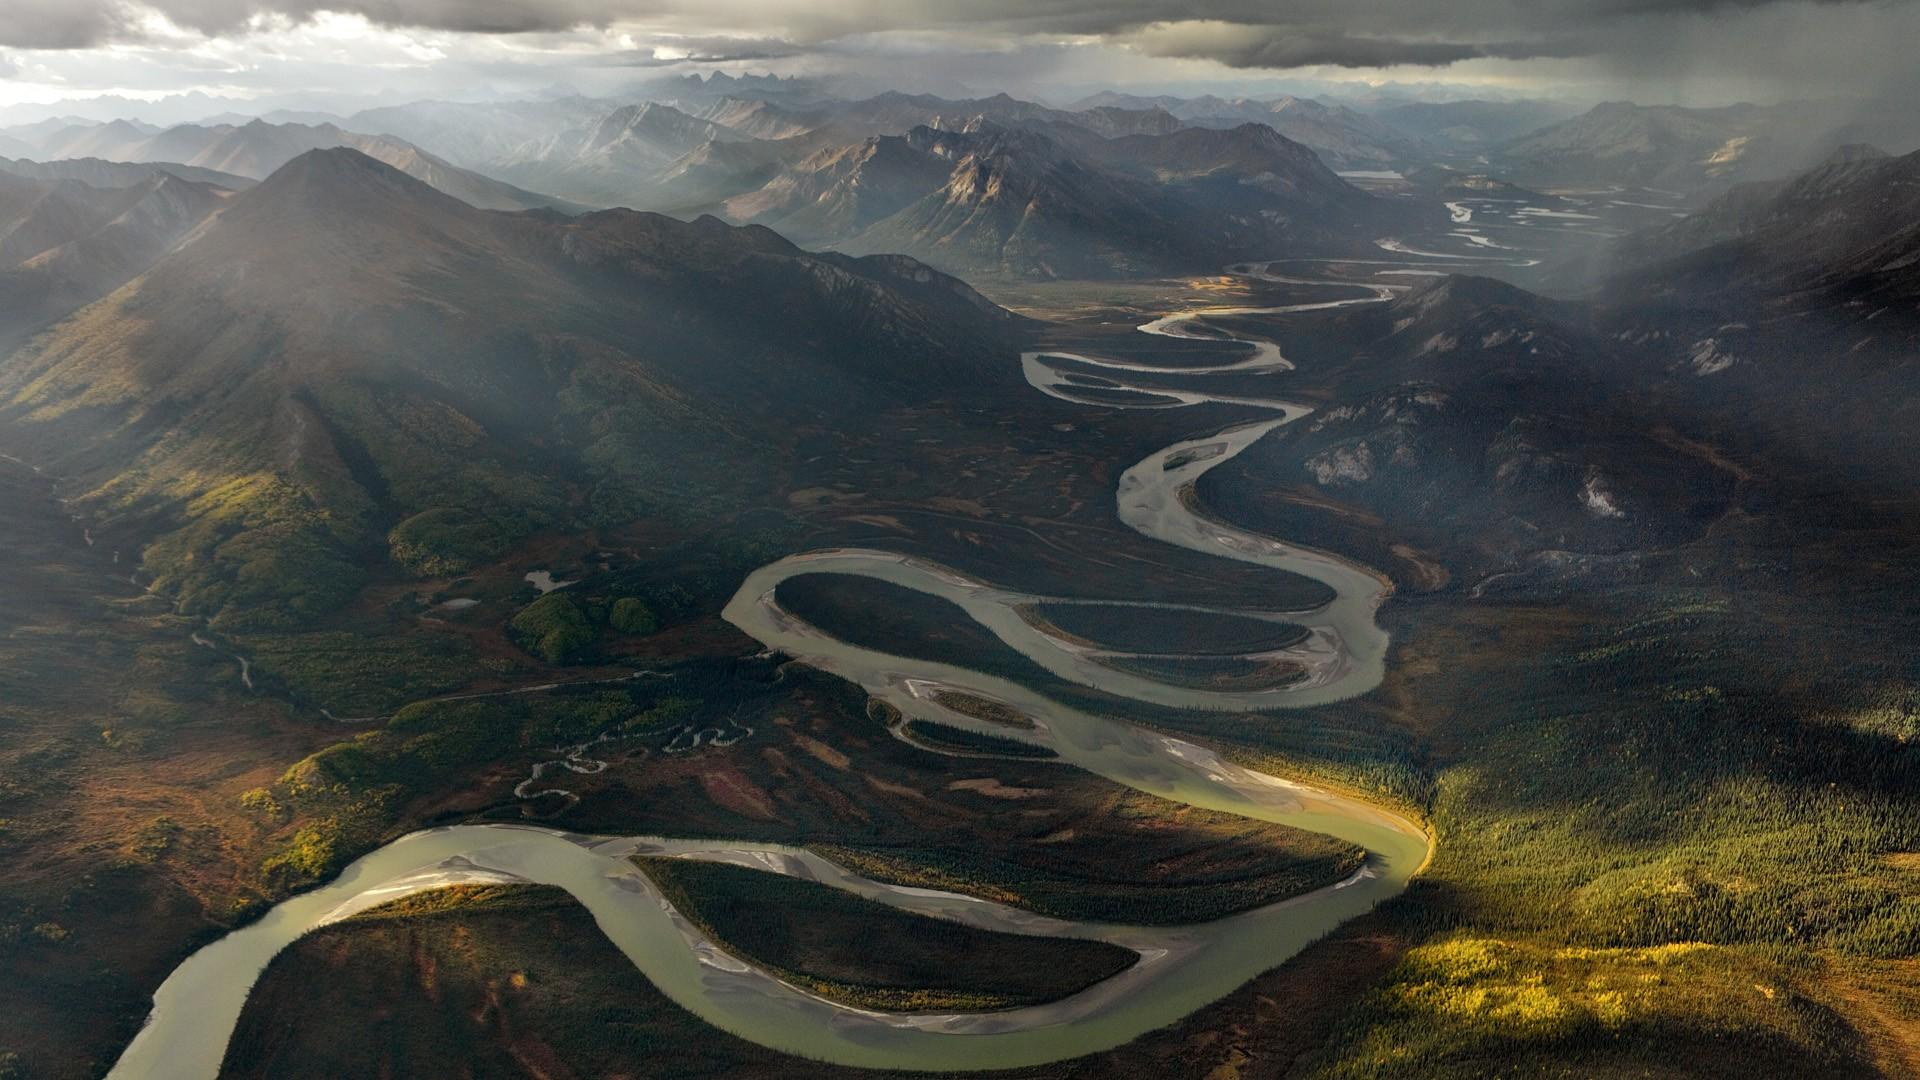 fiumi, rivers